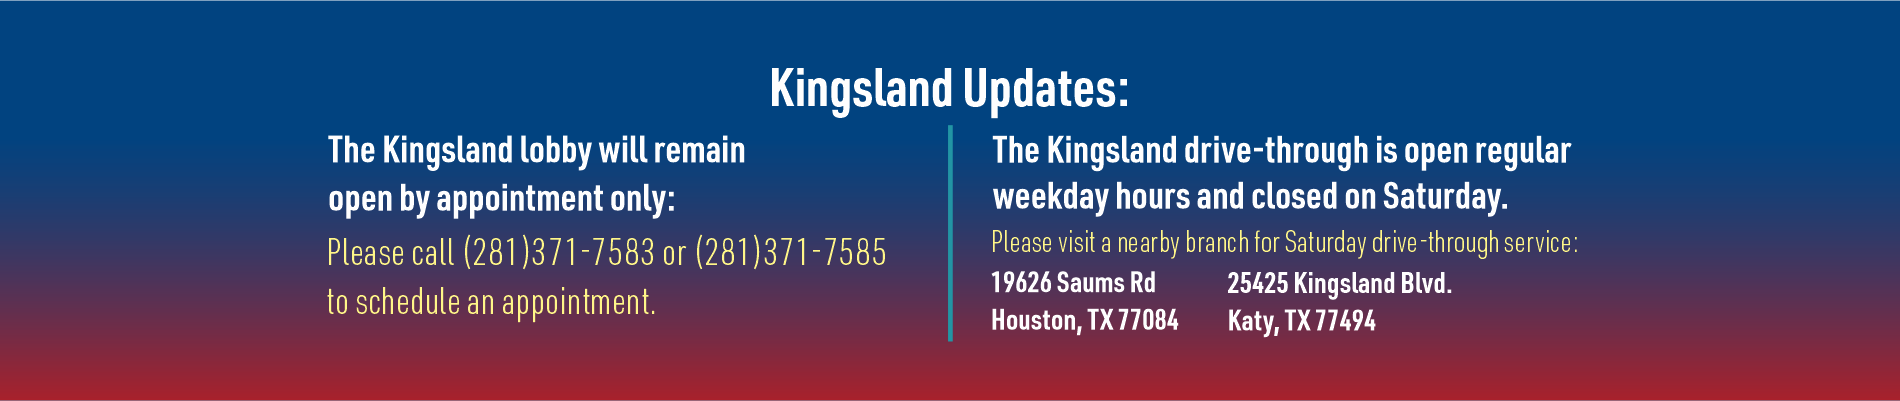 Informative banner about kingsland closure